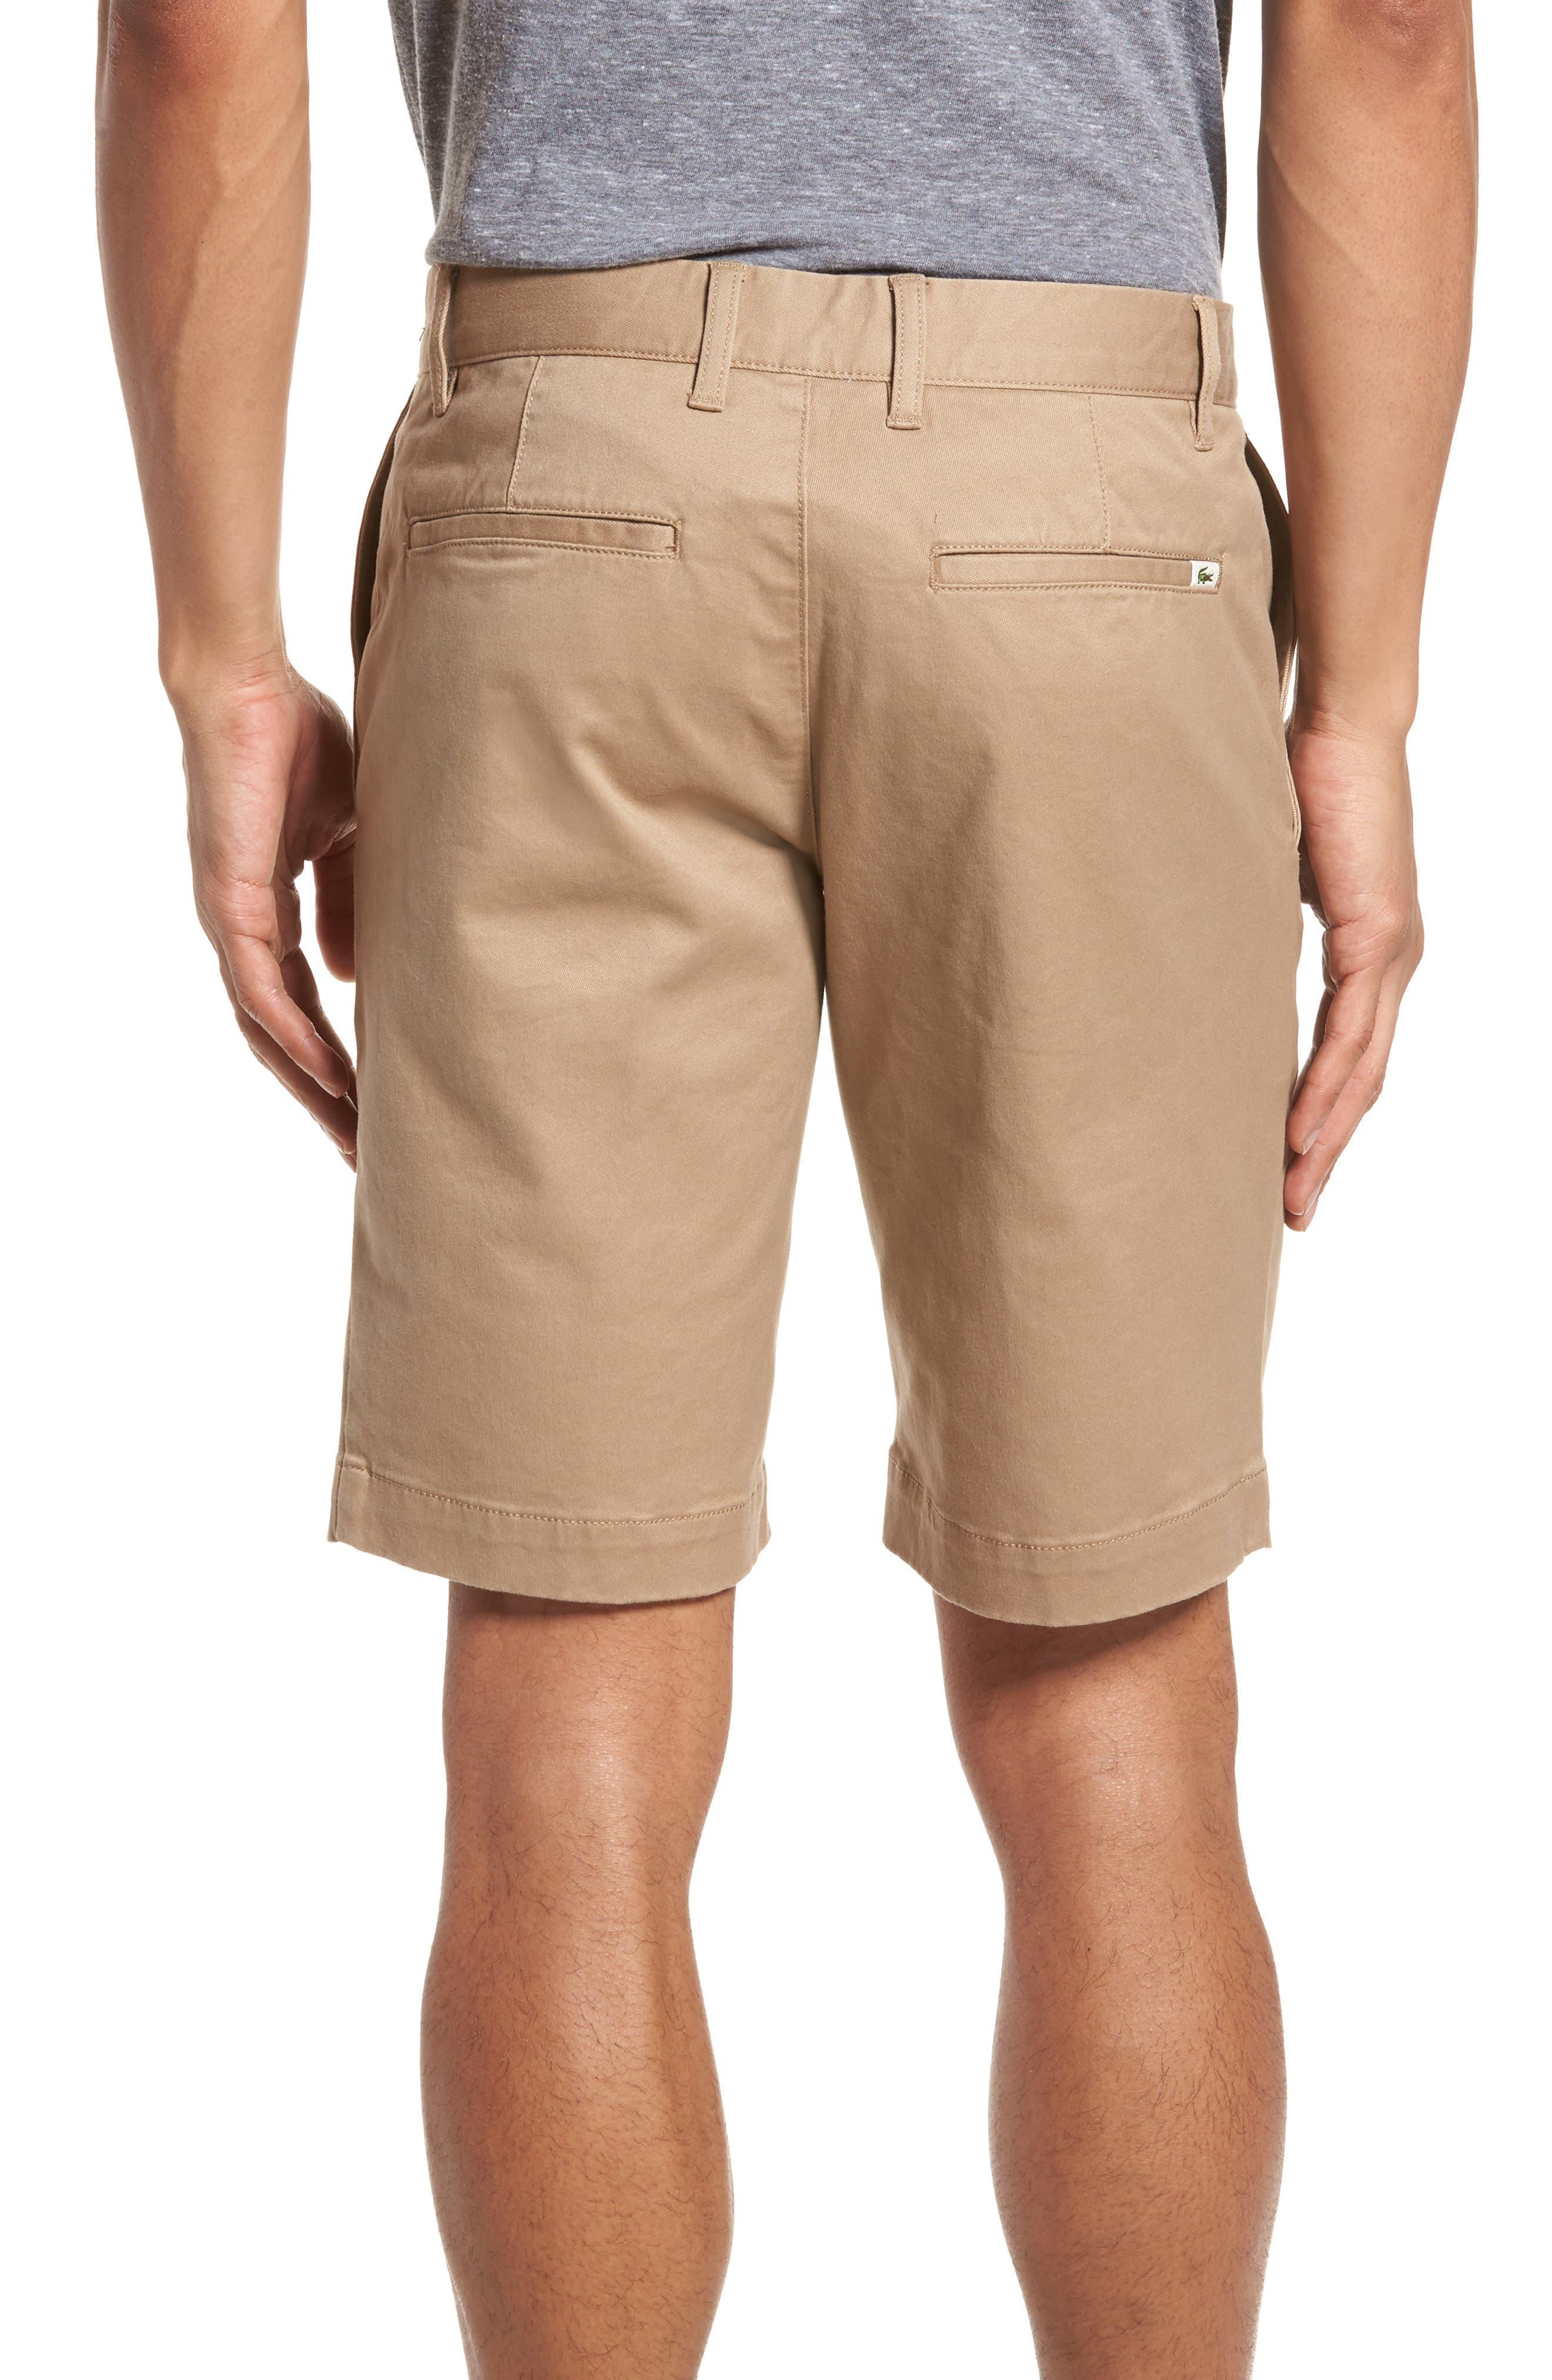 Slim Fit Chino Shorts,                             Alternate thumbnail 2, color,                             Kraft Beige